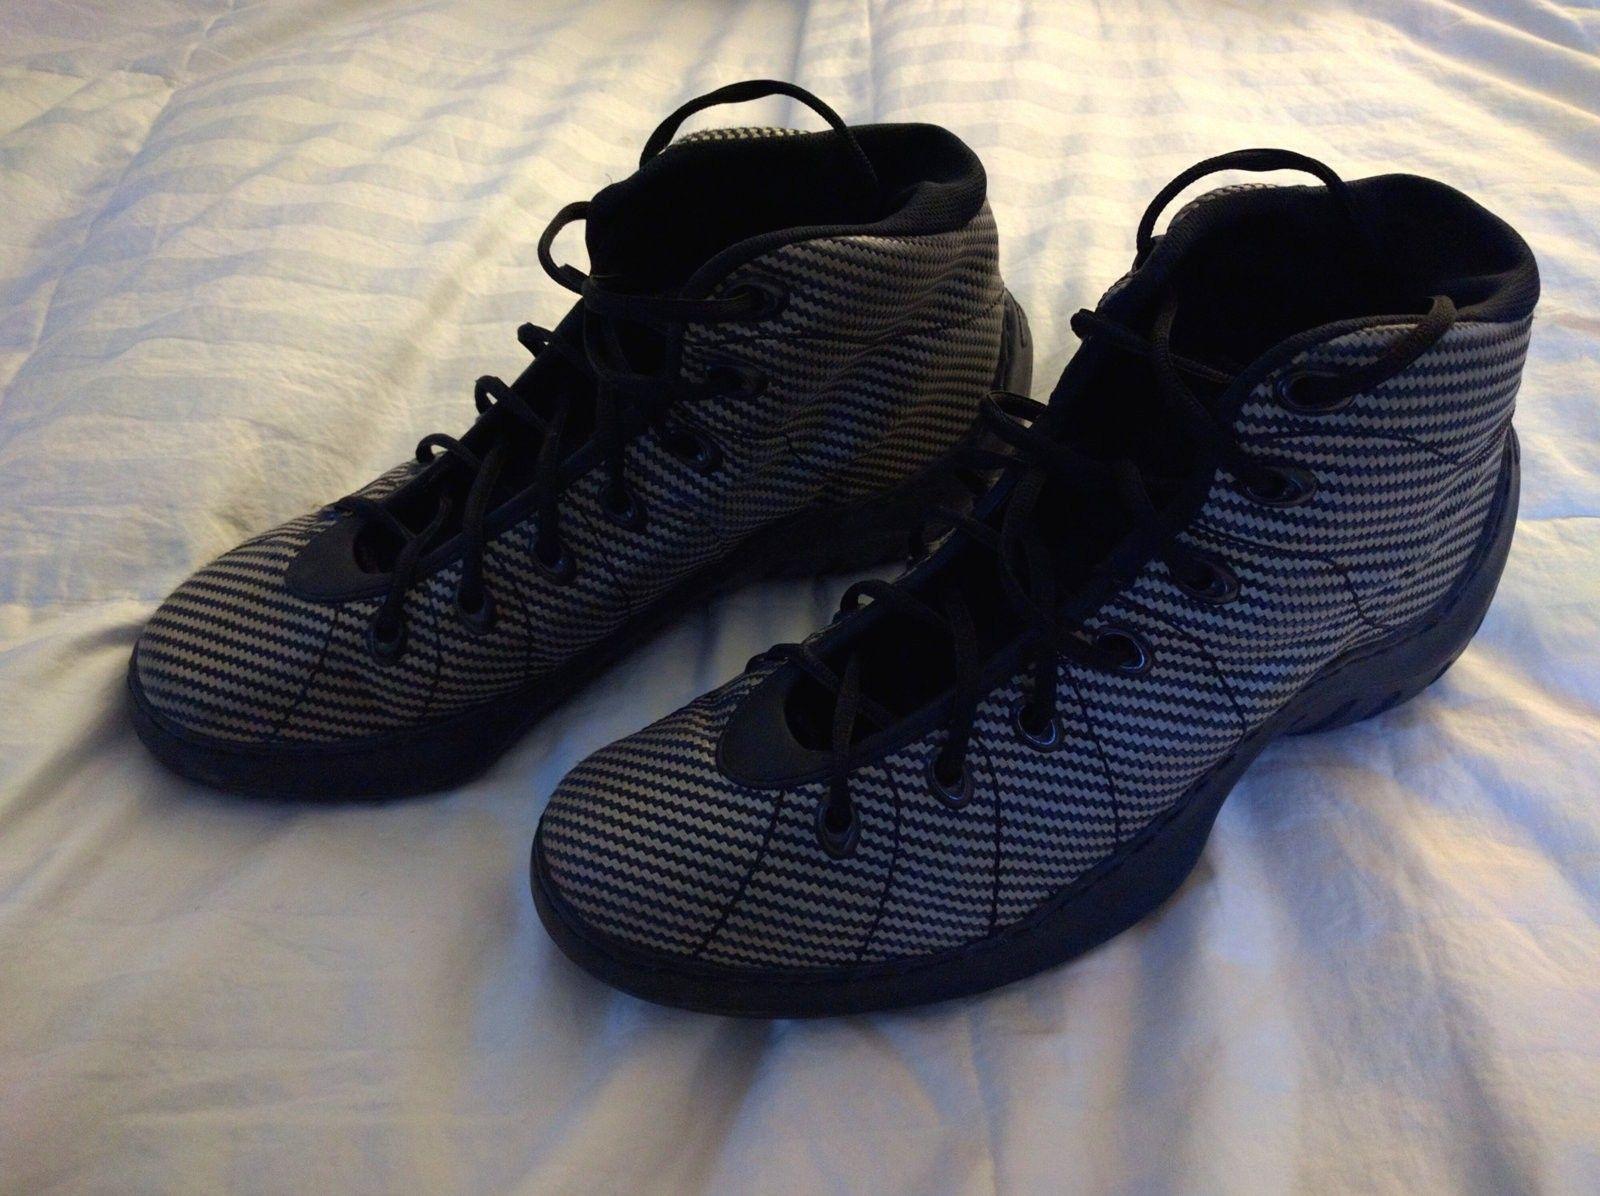 Shoe One(s) - Shoe One Hightop Grey size 13.jpg